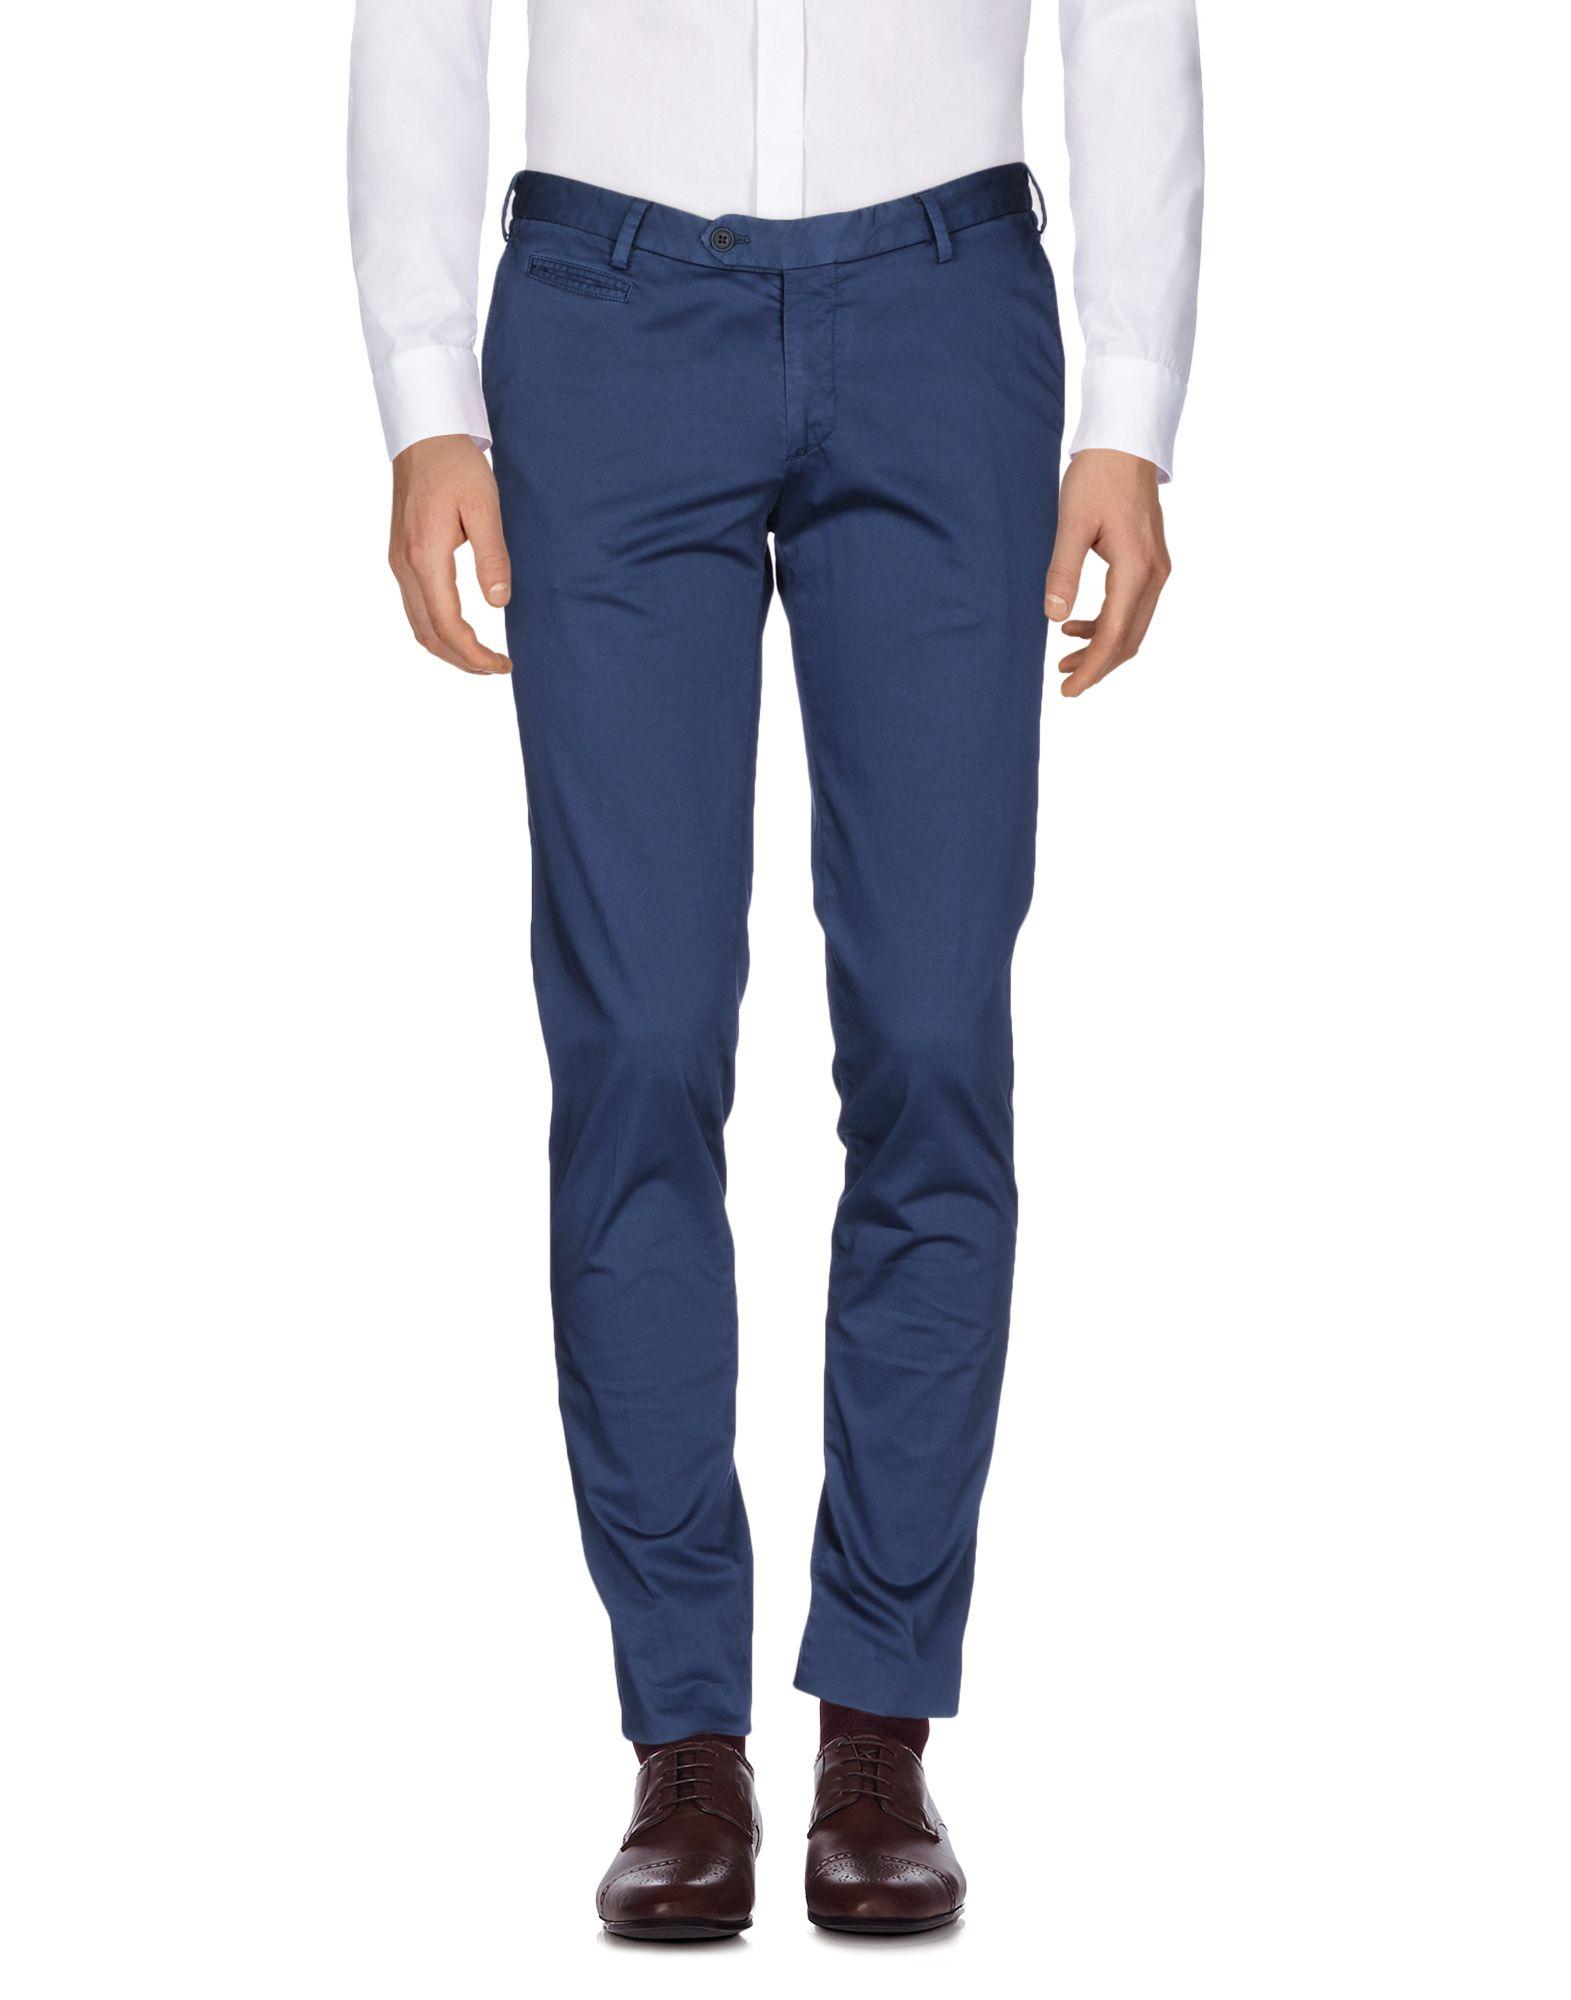 Pantalone Gi Capri Uomo - Acquista online su